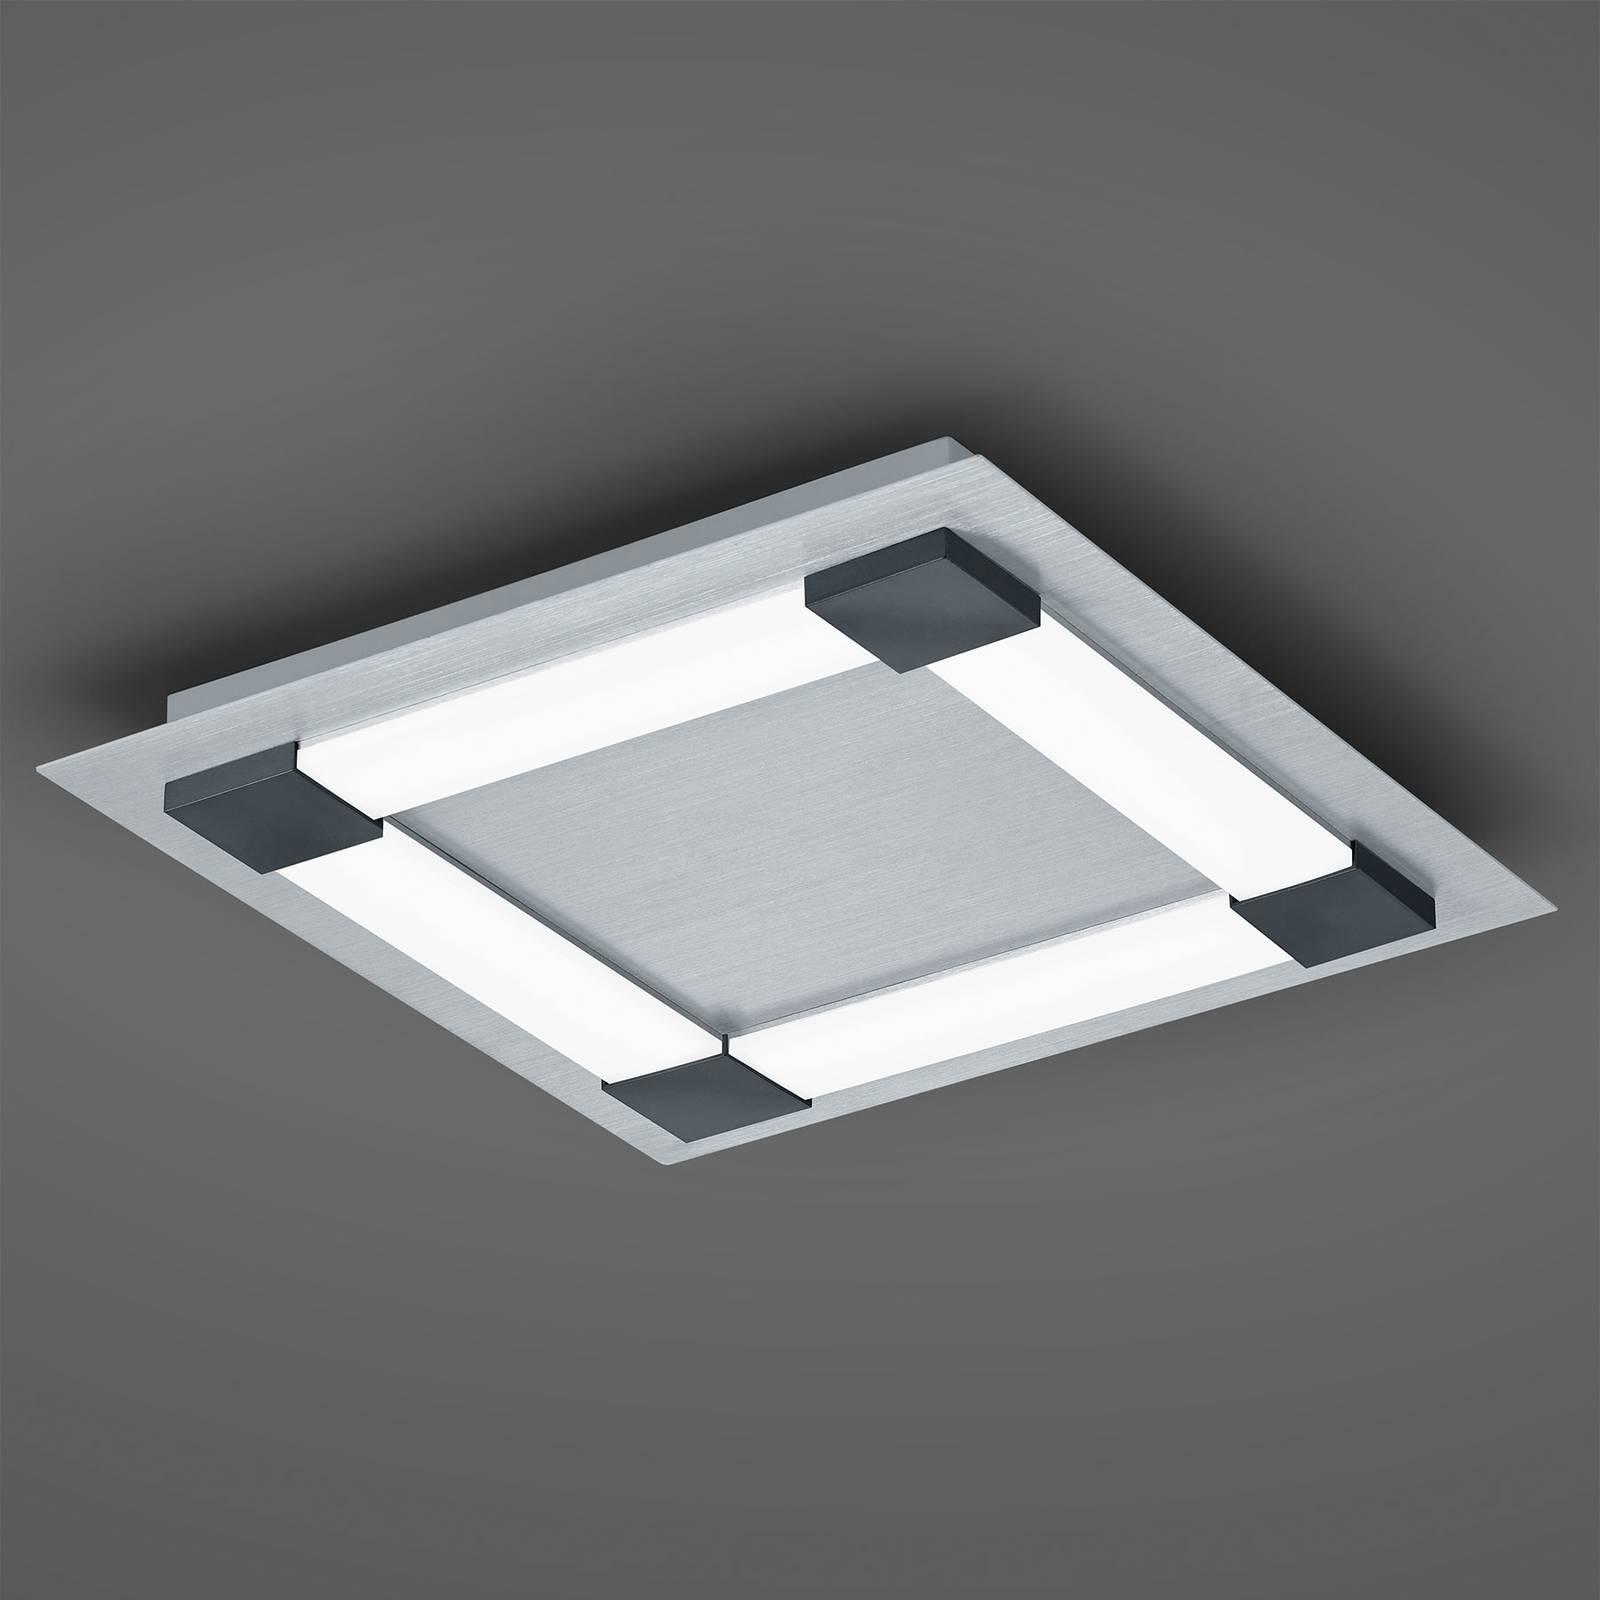 Bopp Plain lampa sufitowa LED 48x48cm sterowana